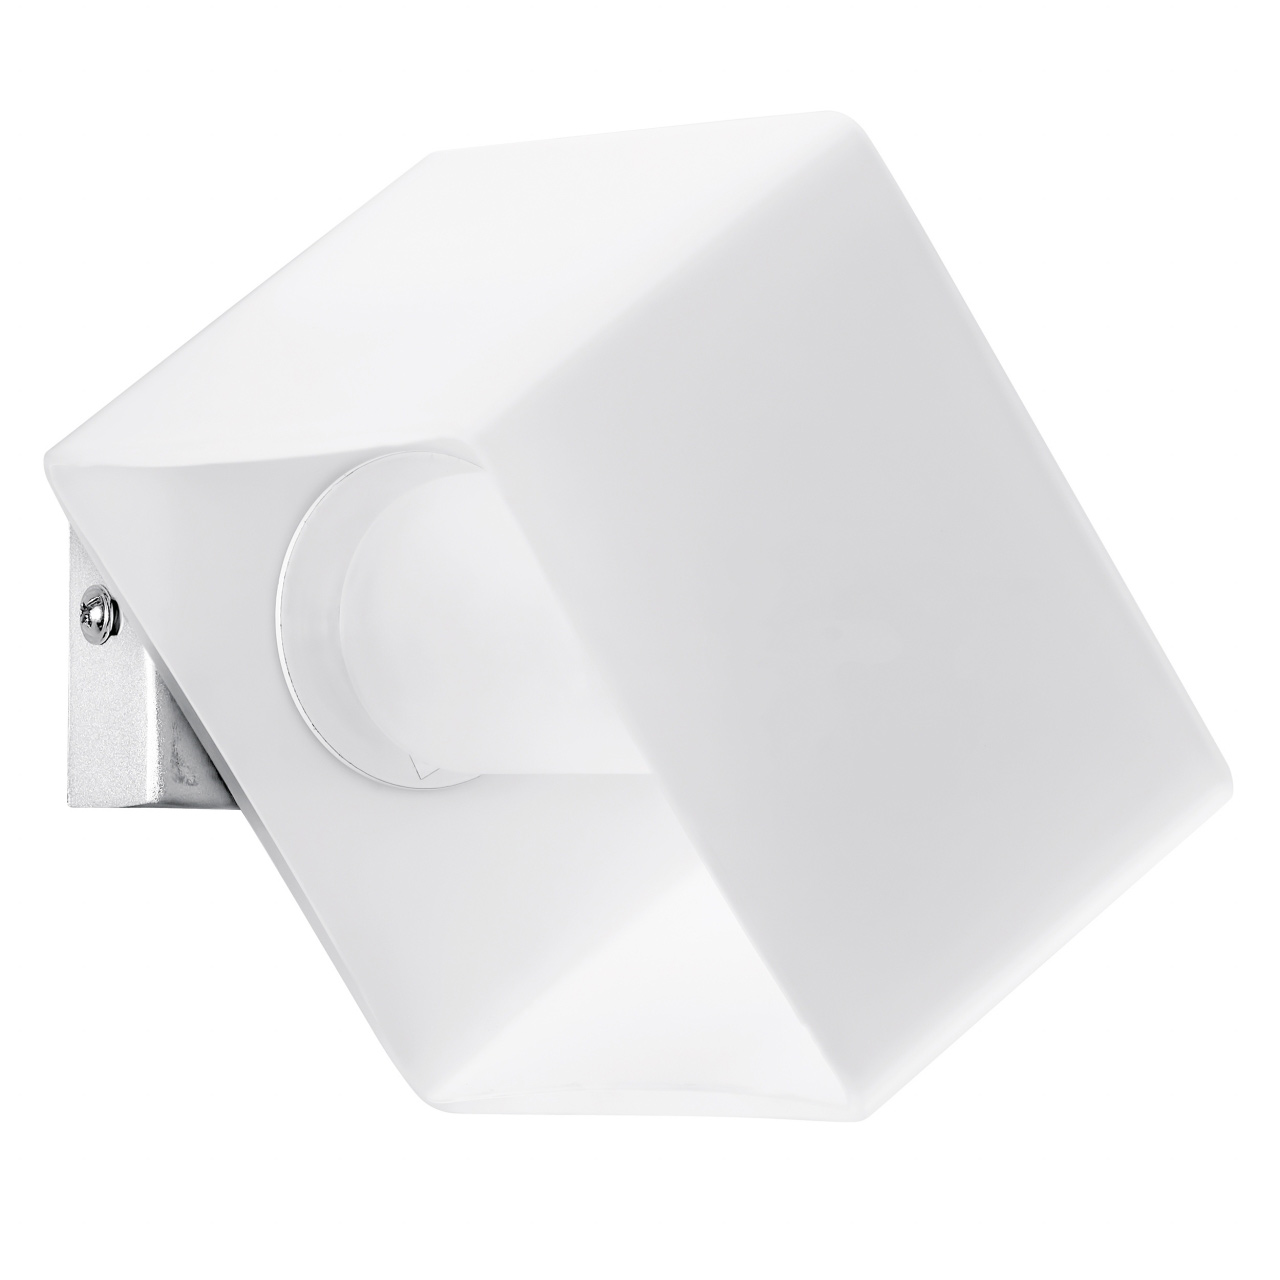 Светильник настенный Pezzo 1х40W G9 хром / белый Lightstar 801610